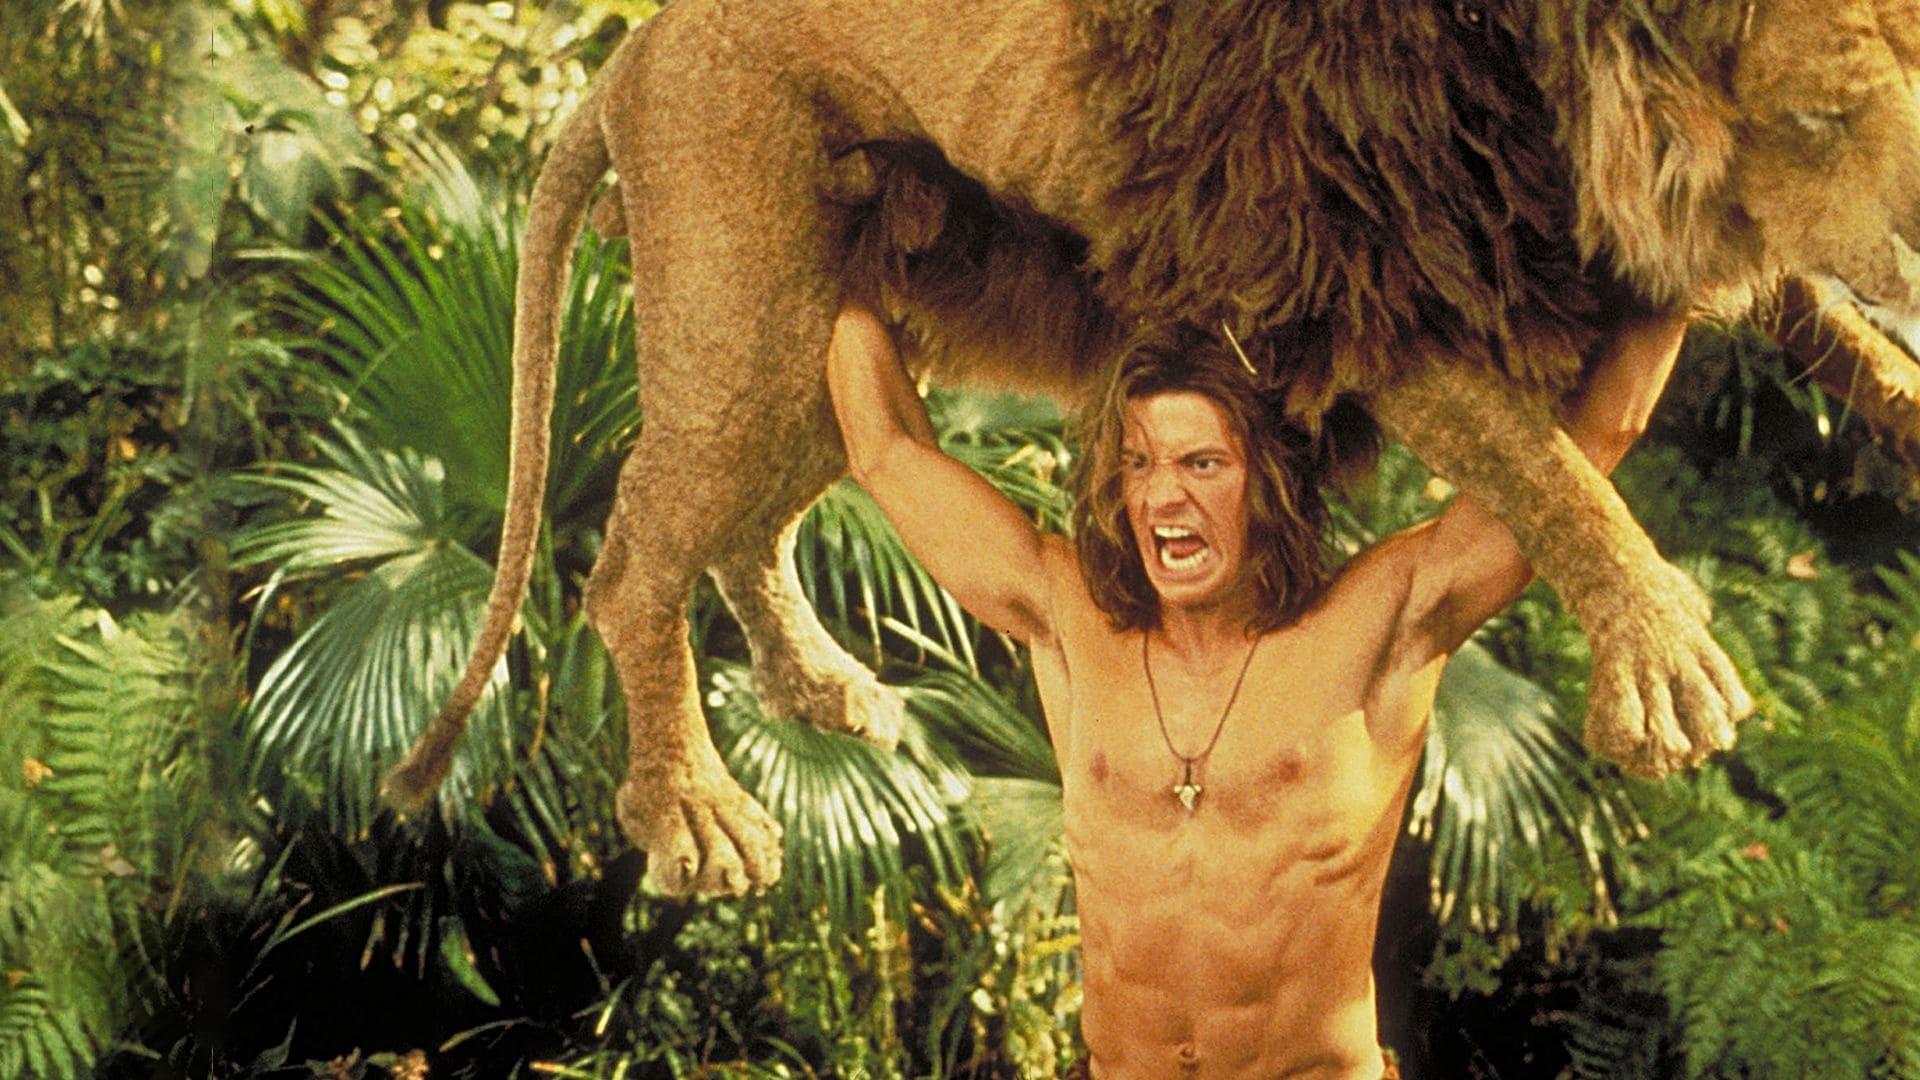 George of the Jungle (1997) Full Movie